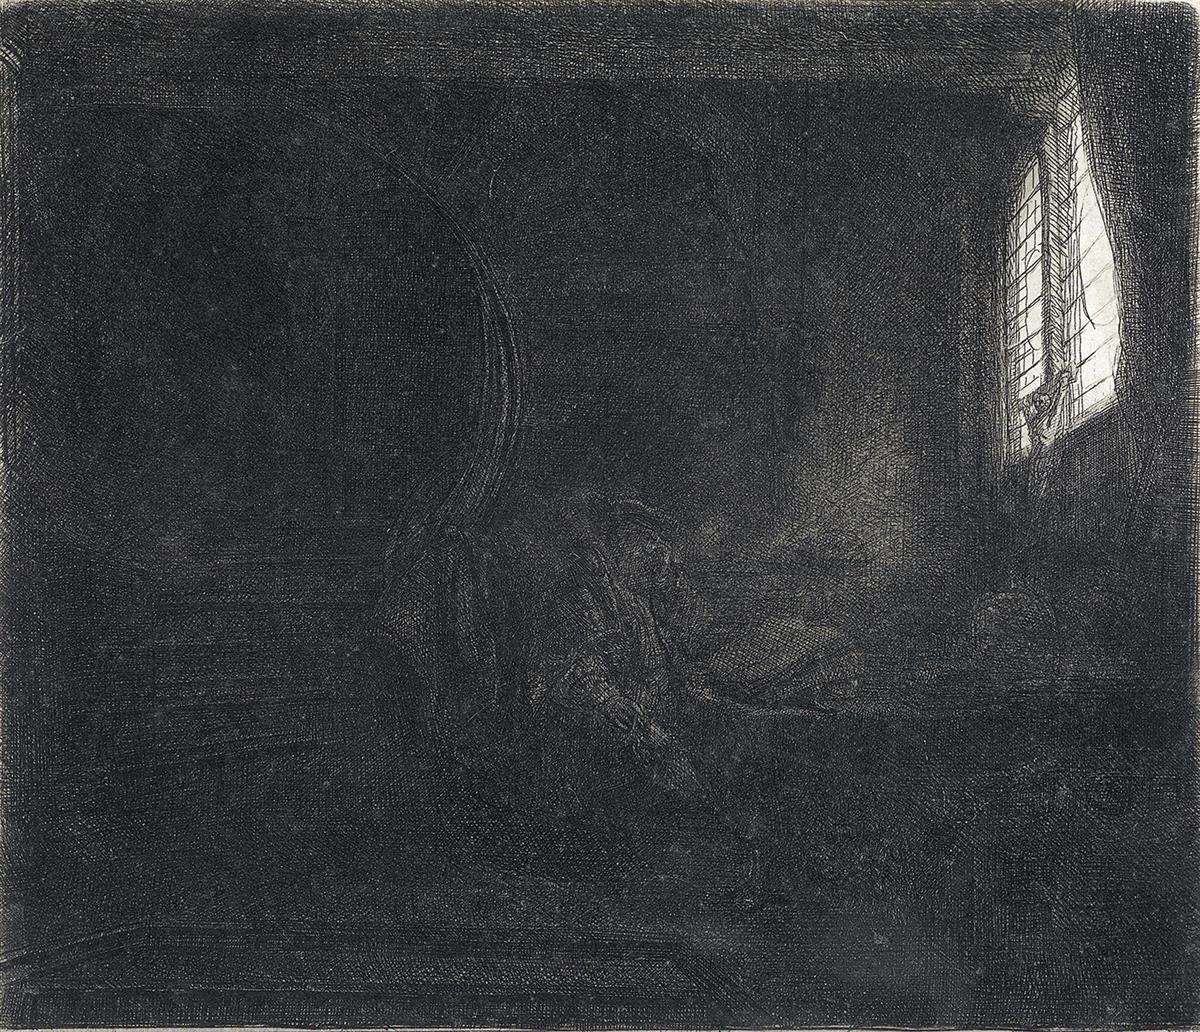 REMBRANDT-VAN-RIJN-St-Jerome-in-a-Dark-Chamber